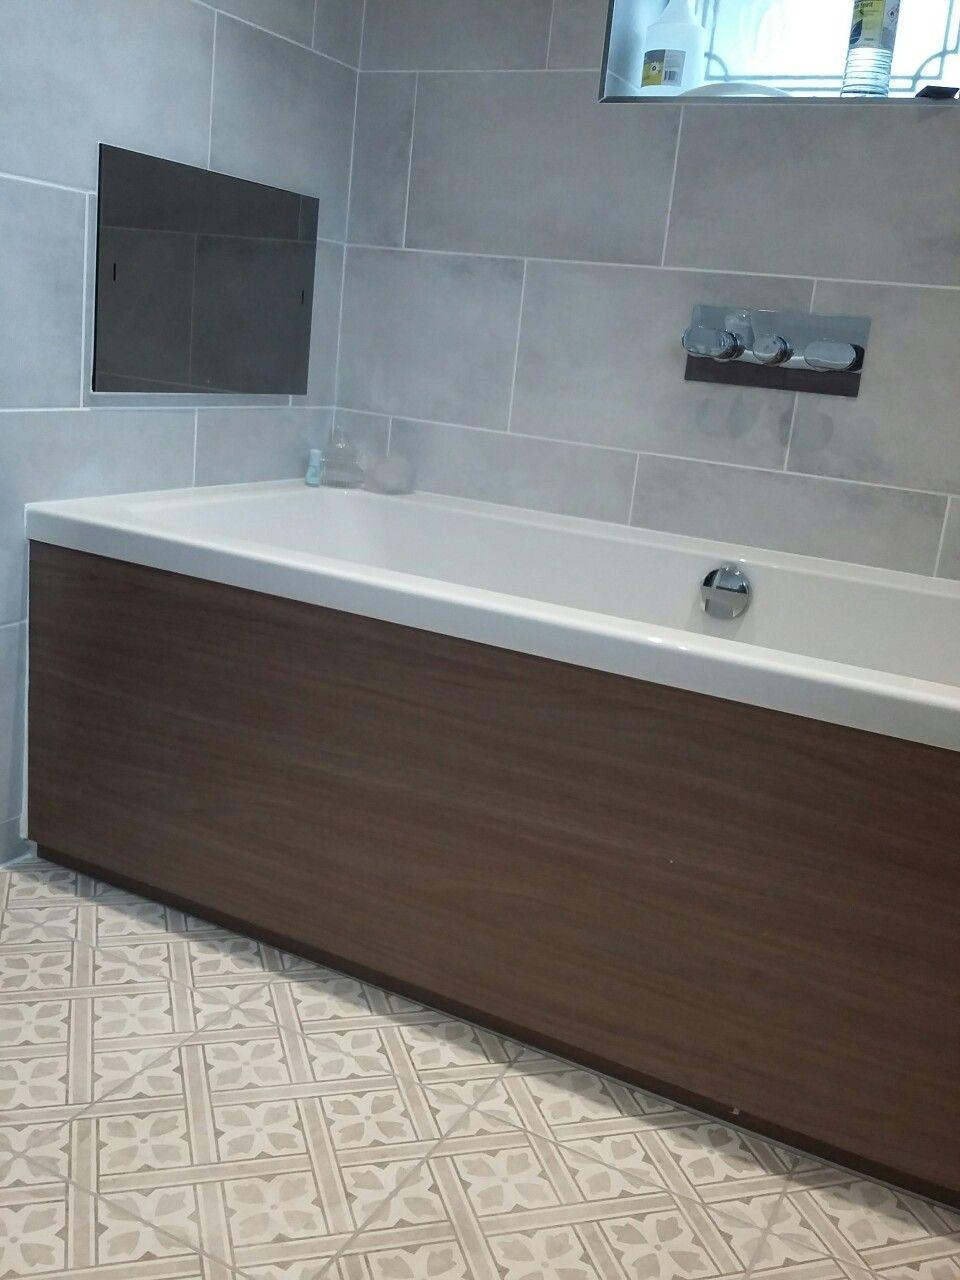 Waterproof Mirror Effect Bathroom Tv Laura Ashley Mr Jones Tiles Ted Baker  Tiles Walnut Bathroom Cabinet